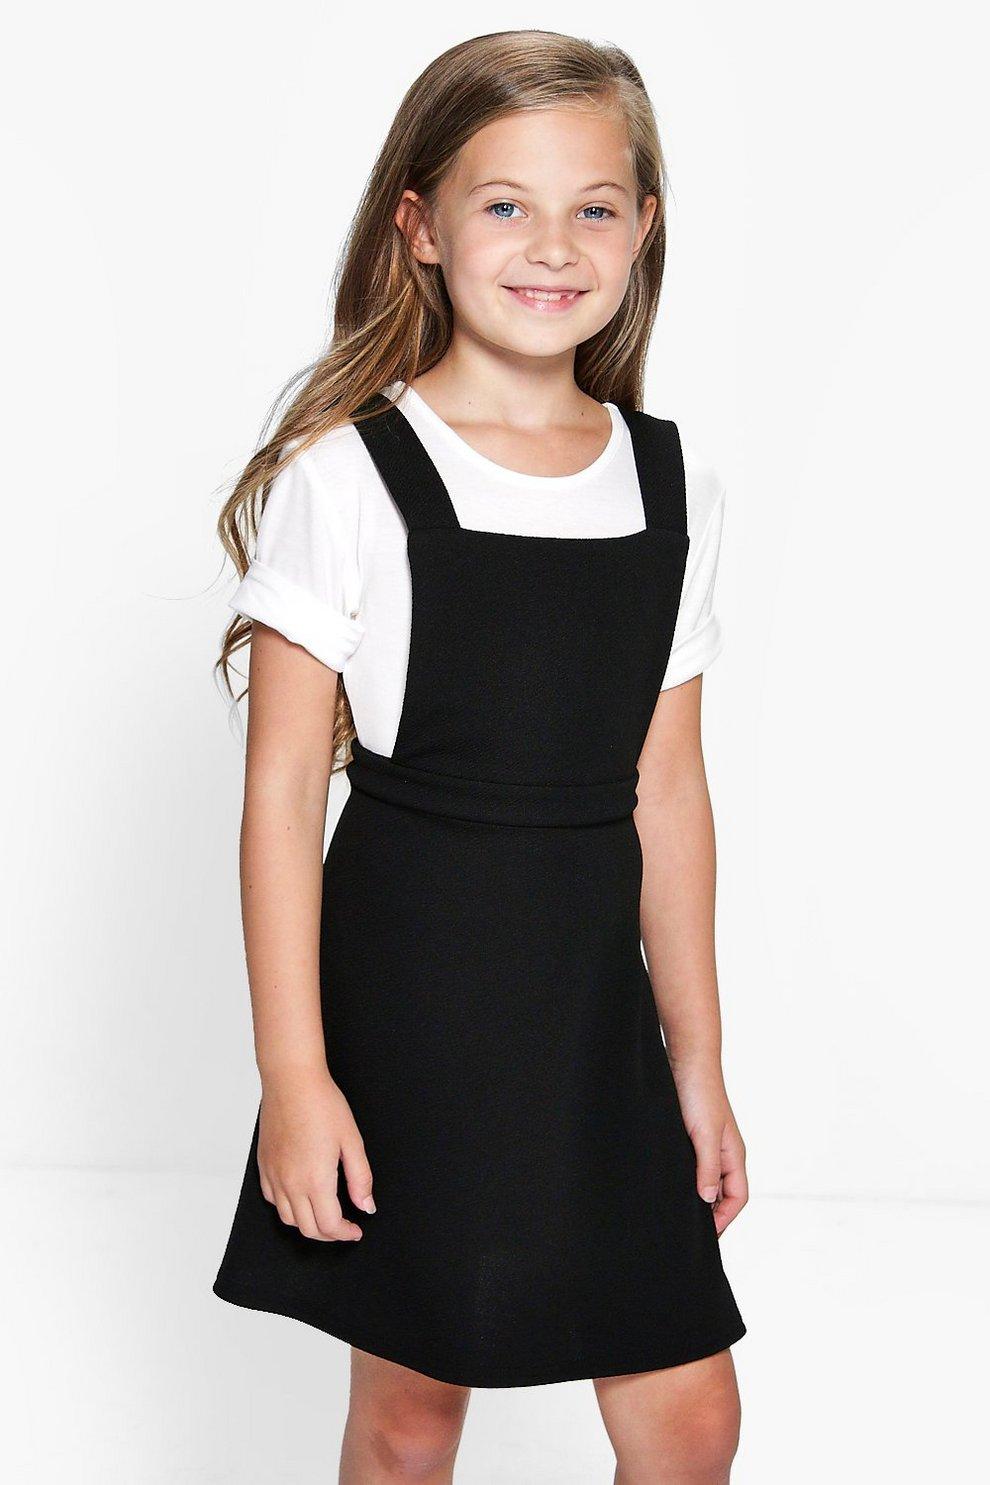 d08c7c6a0c6b Girls Pinafore Dress & Tee Set | Boohoo